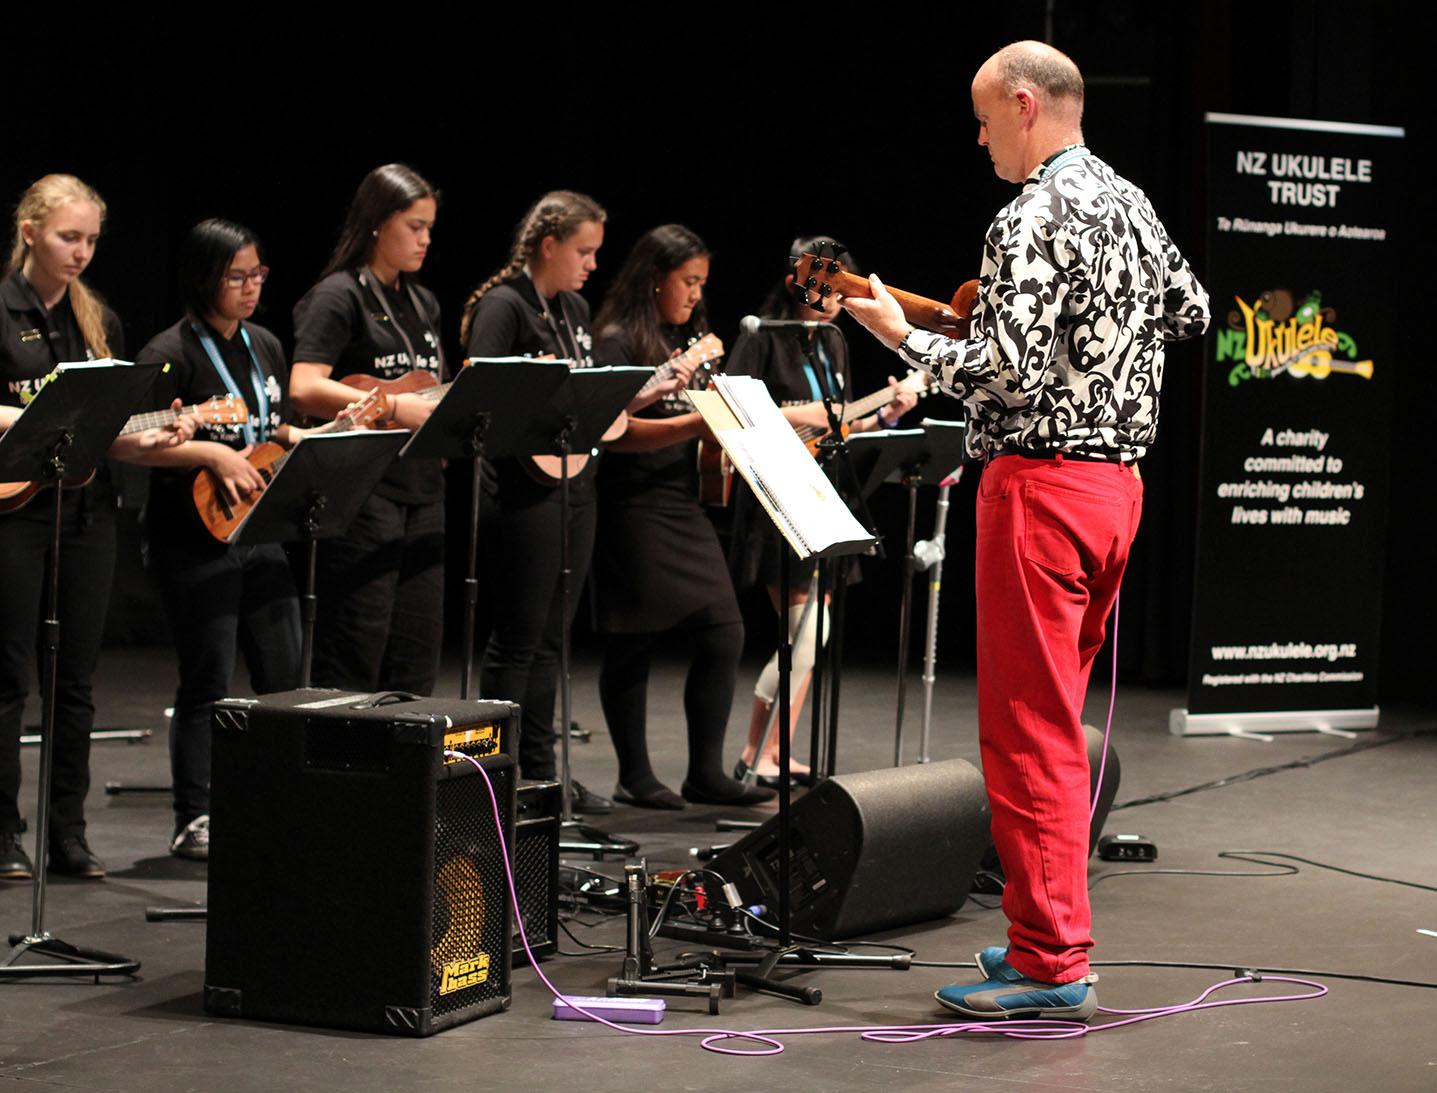 NZ_Ukulele_Squads_James_Hill_rehearsal_20171124_0346.JPG